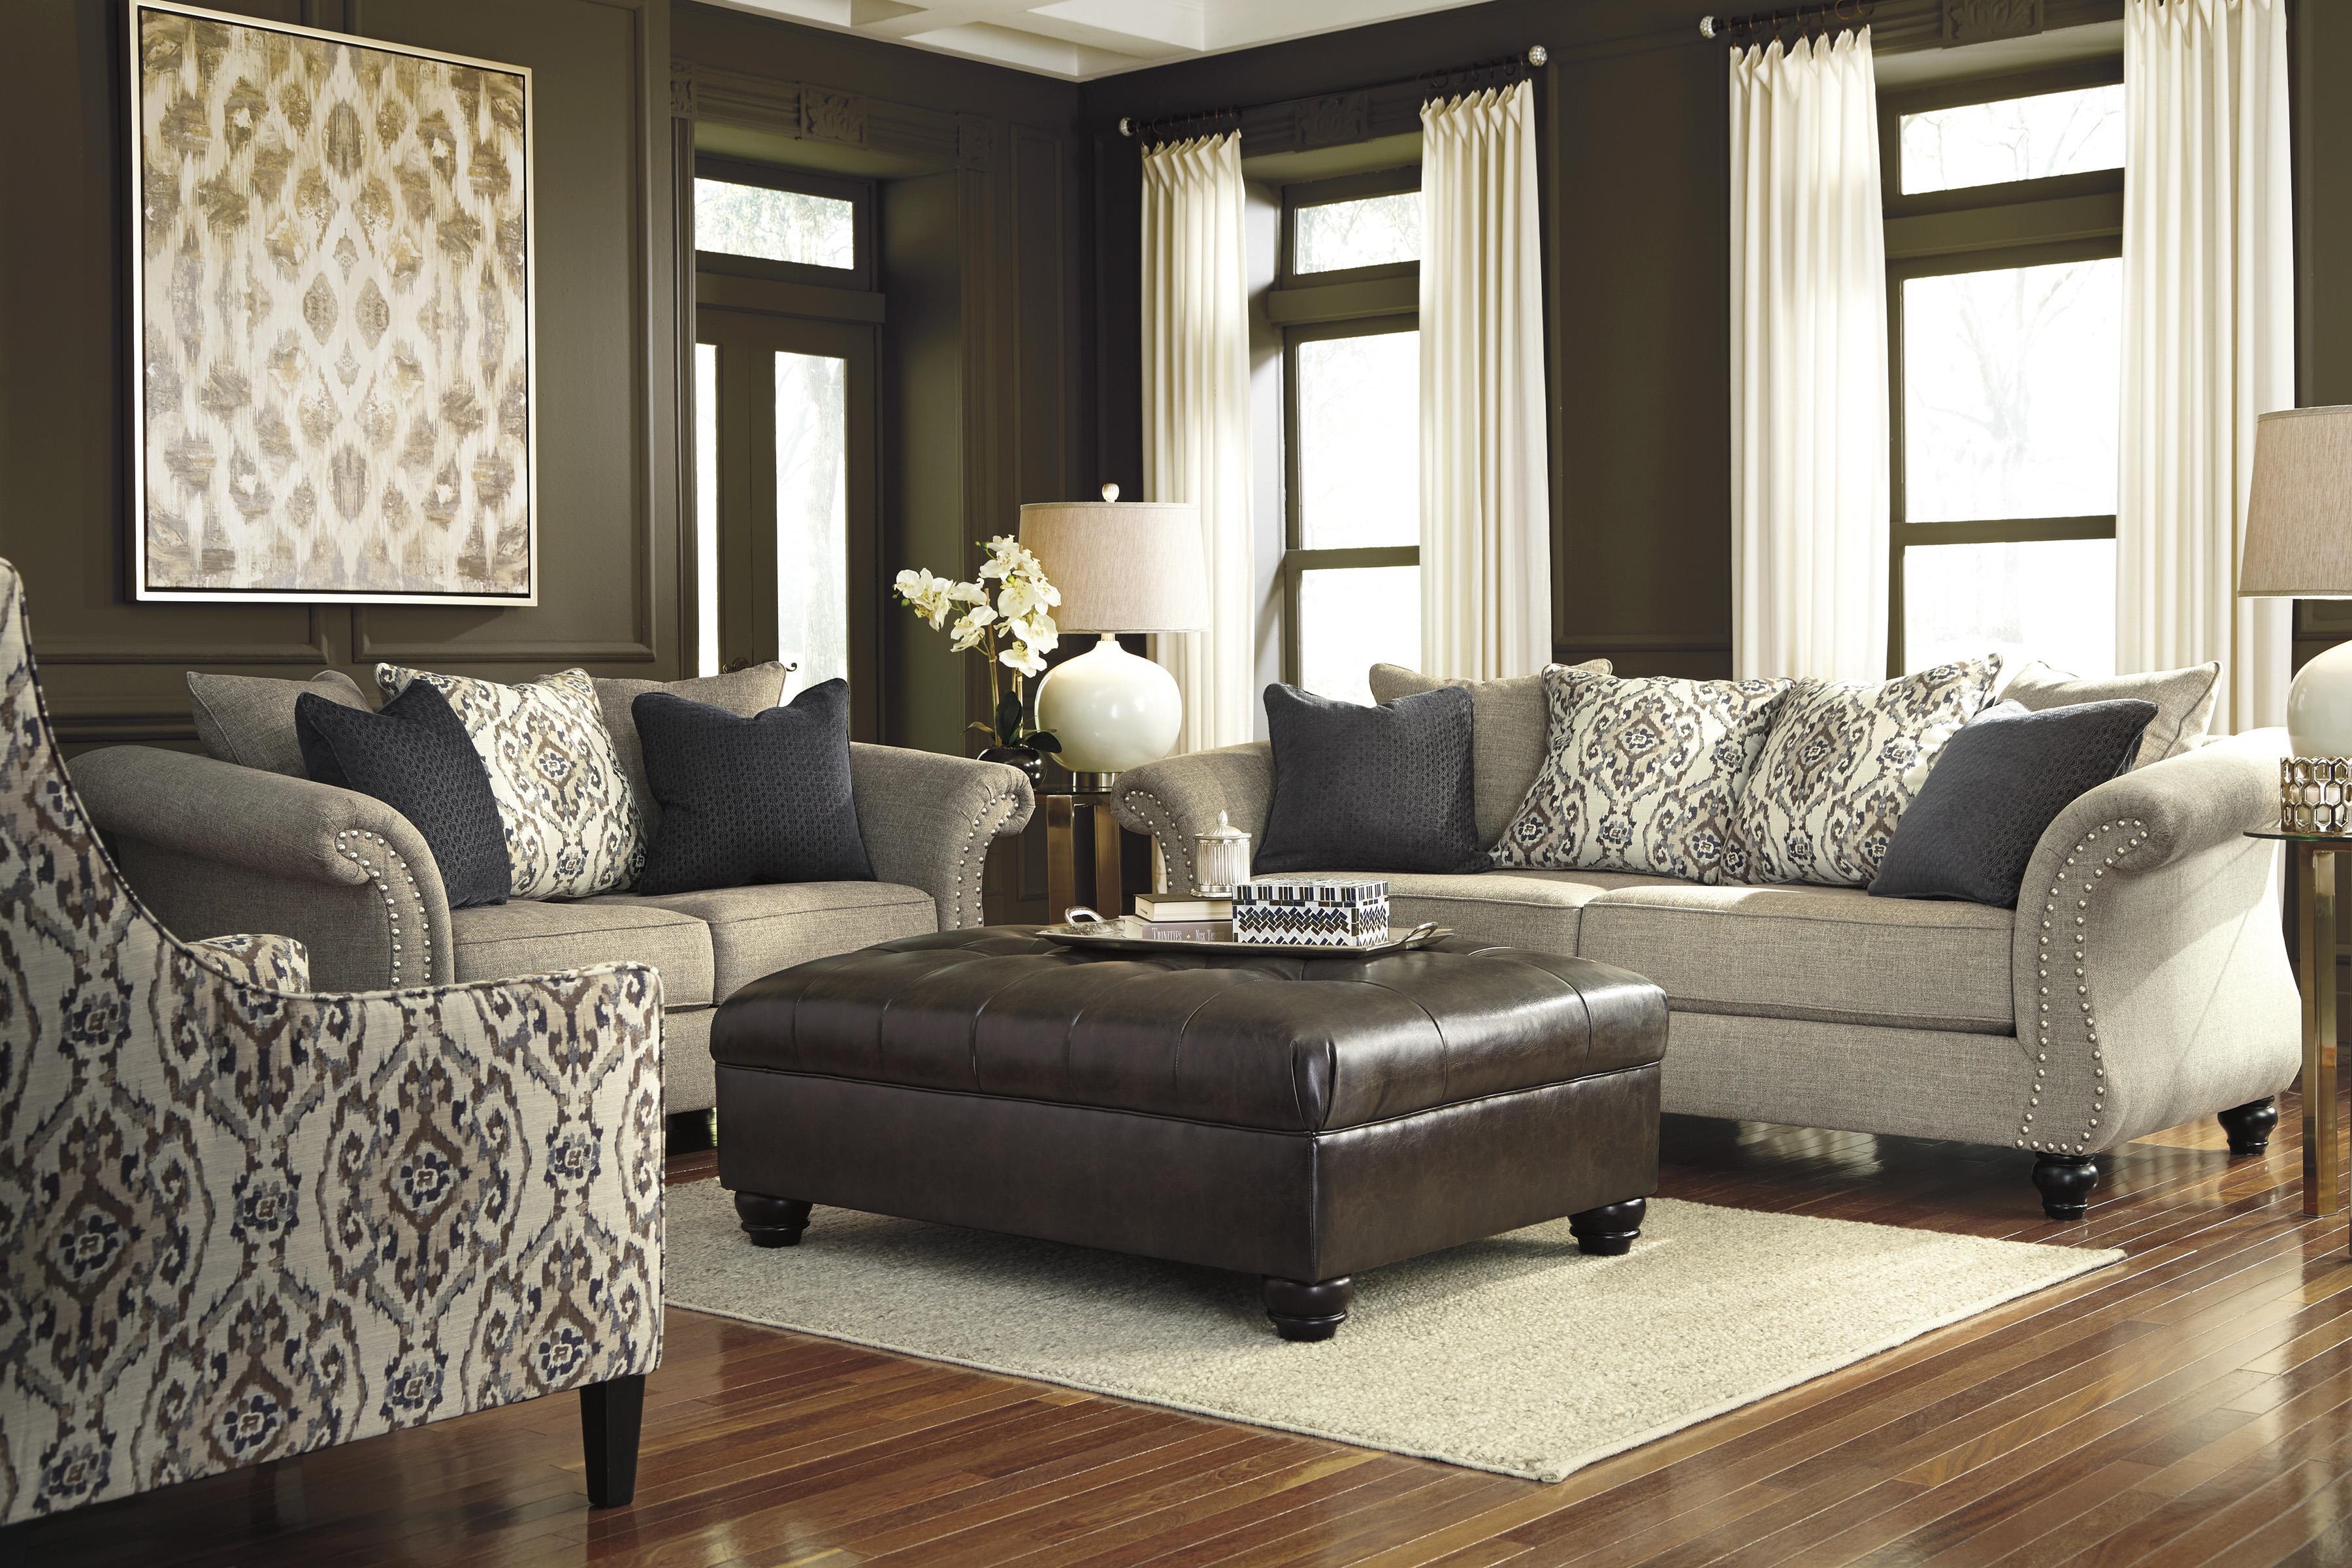 Benchcraft Jonette Stationary Living Room Group - Item Number: 46101 Living Room Group 4